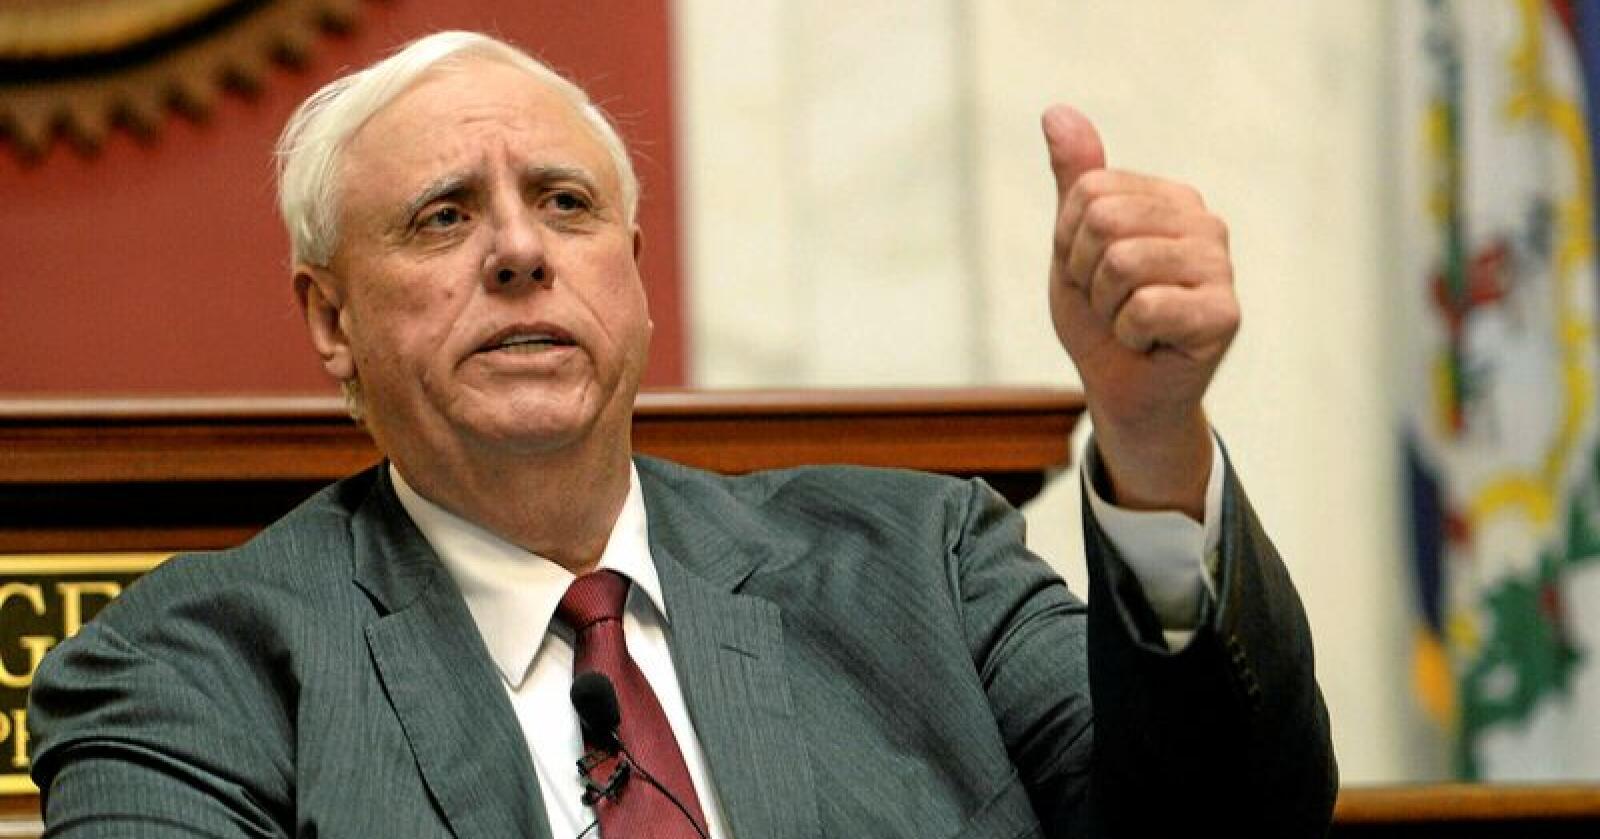 West Virginia-guvernør Jim Justice. Foto: Chris Dorst / Charleston Gazette-Mail via AP / NTB Scanpix